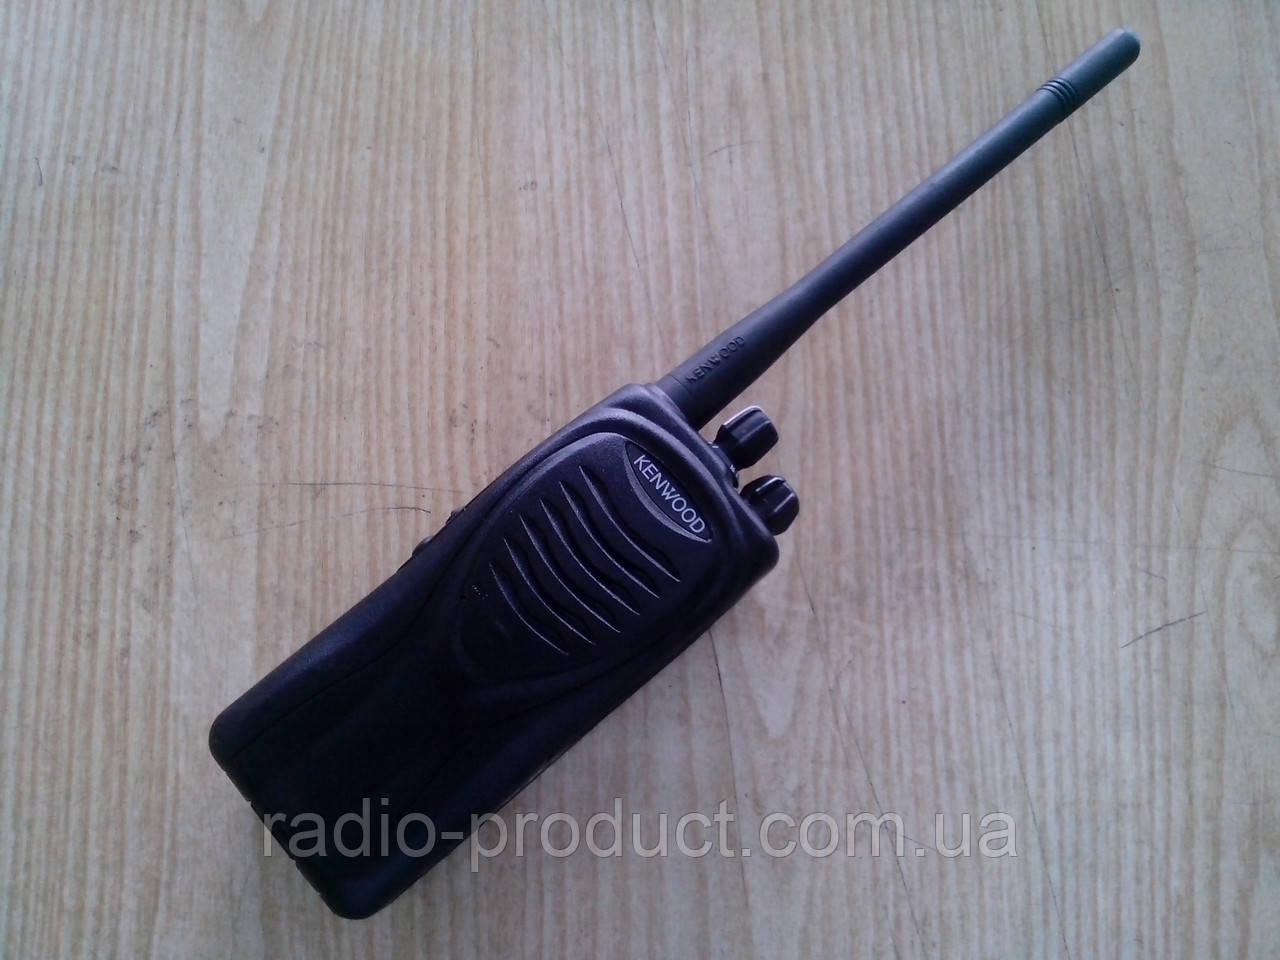 Радиостанция Kenwood TK-2260 (2206) оригинал, б/у